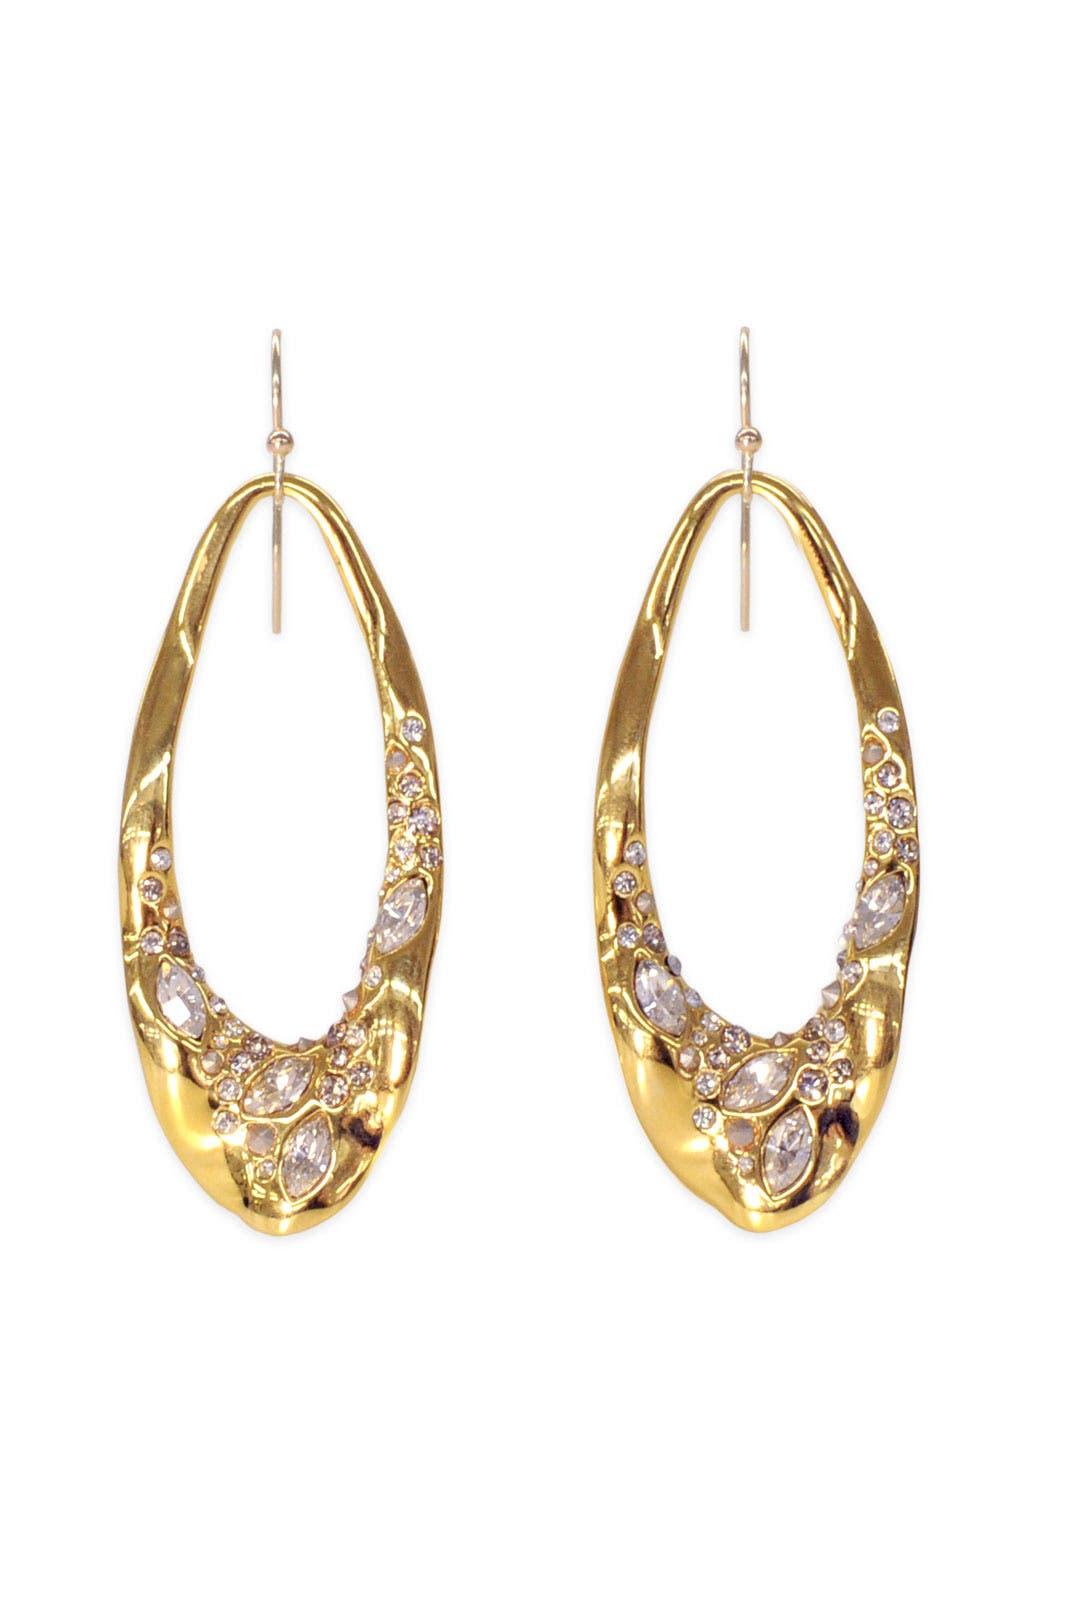 Crystal Orbit Earrings by Alexis Bittar